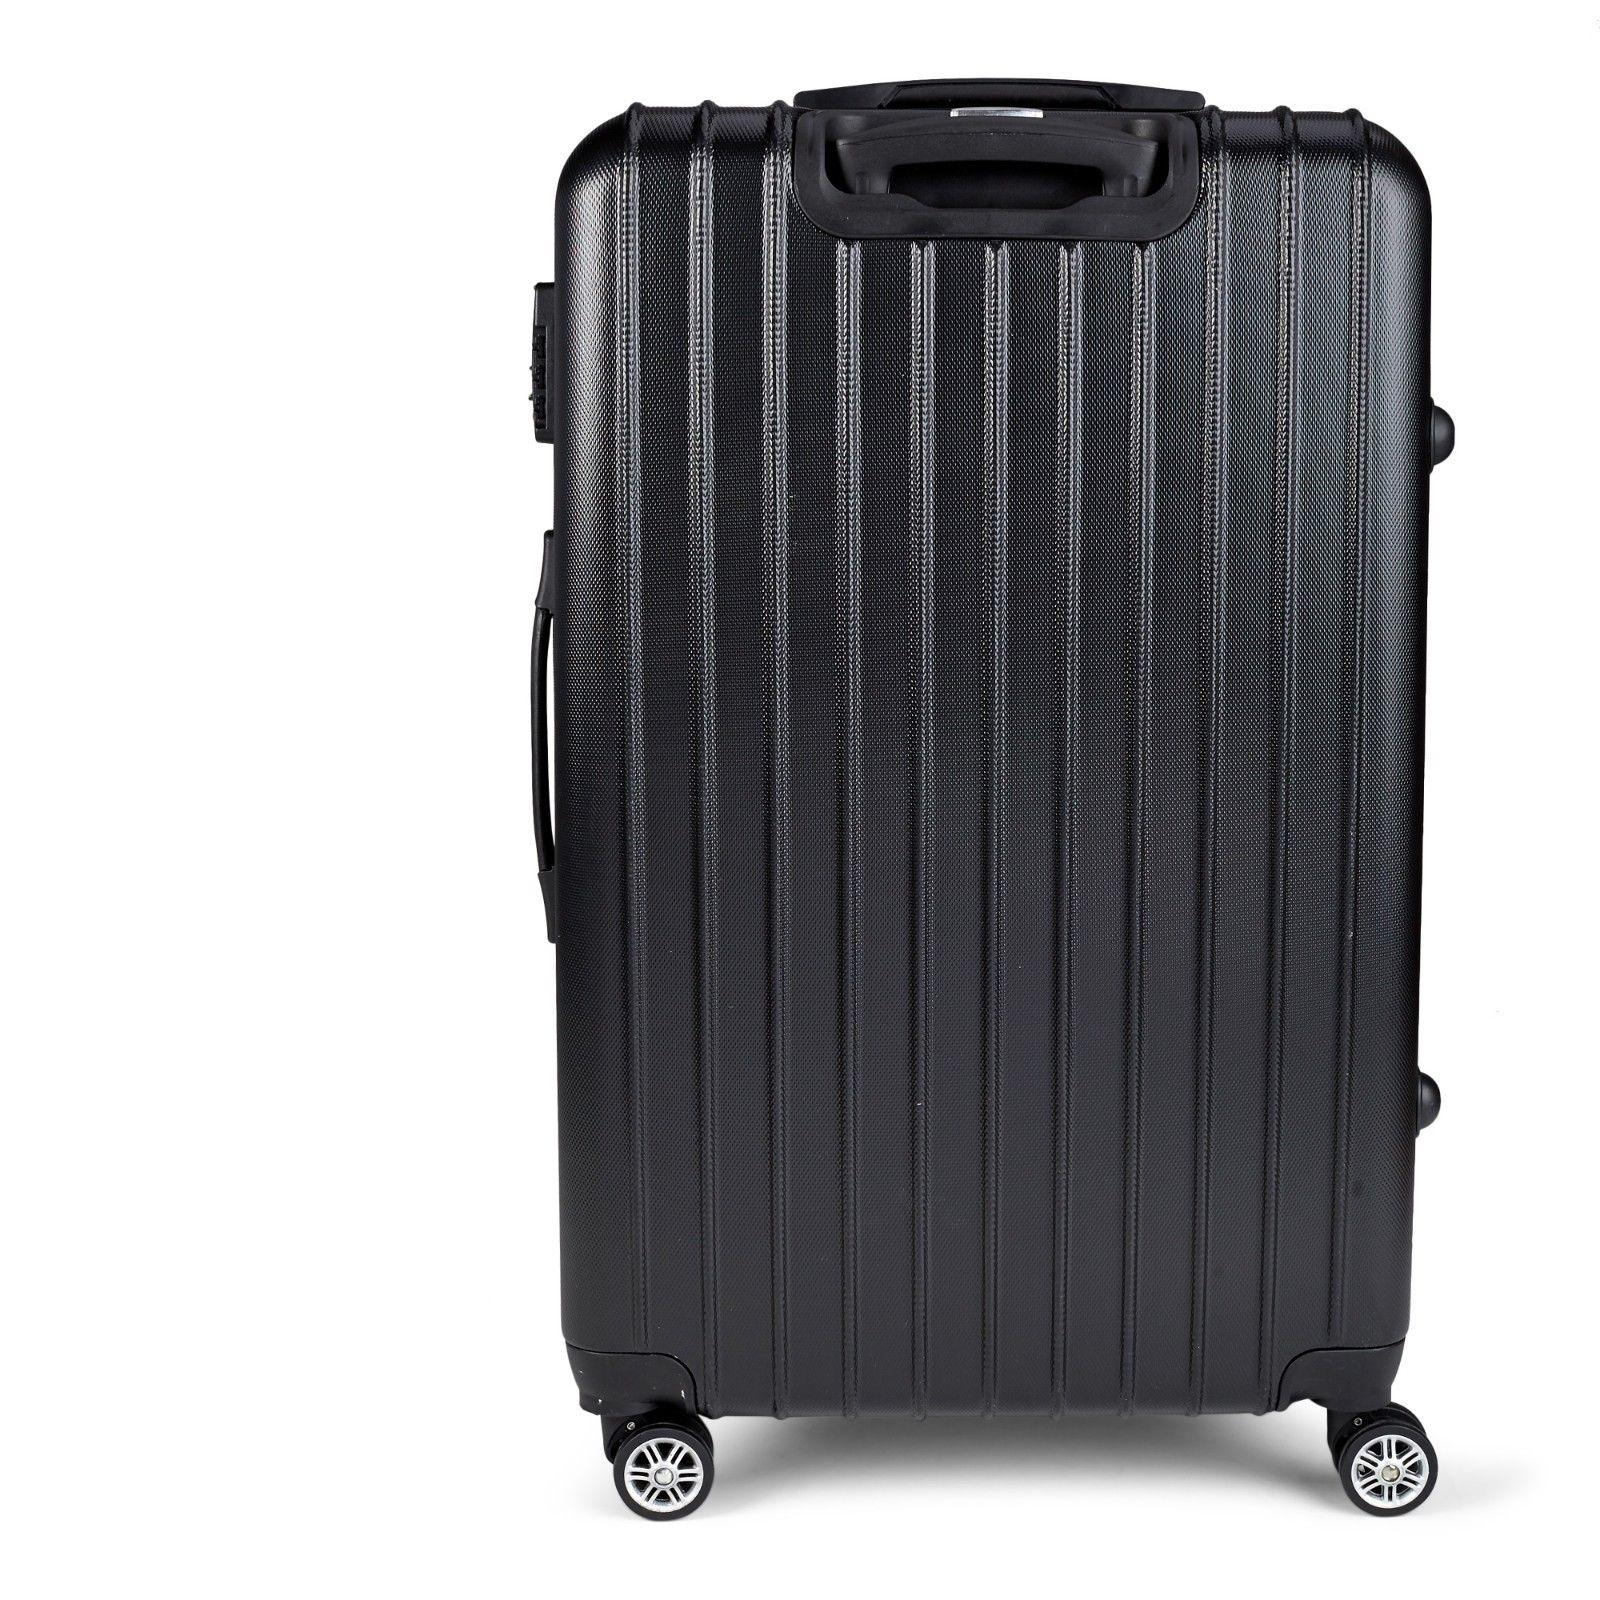 Milano-Premium-3pc-ABS-Luggage-Suitcase-Luxury-Hard-Case-Shockproof-Travel-Set thumbnail 7